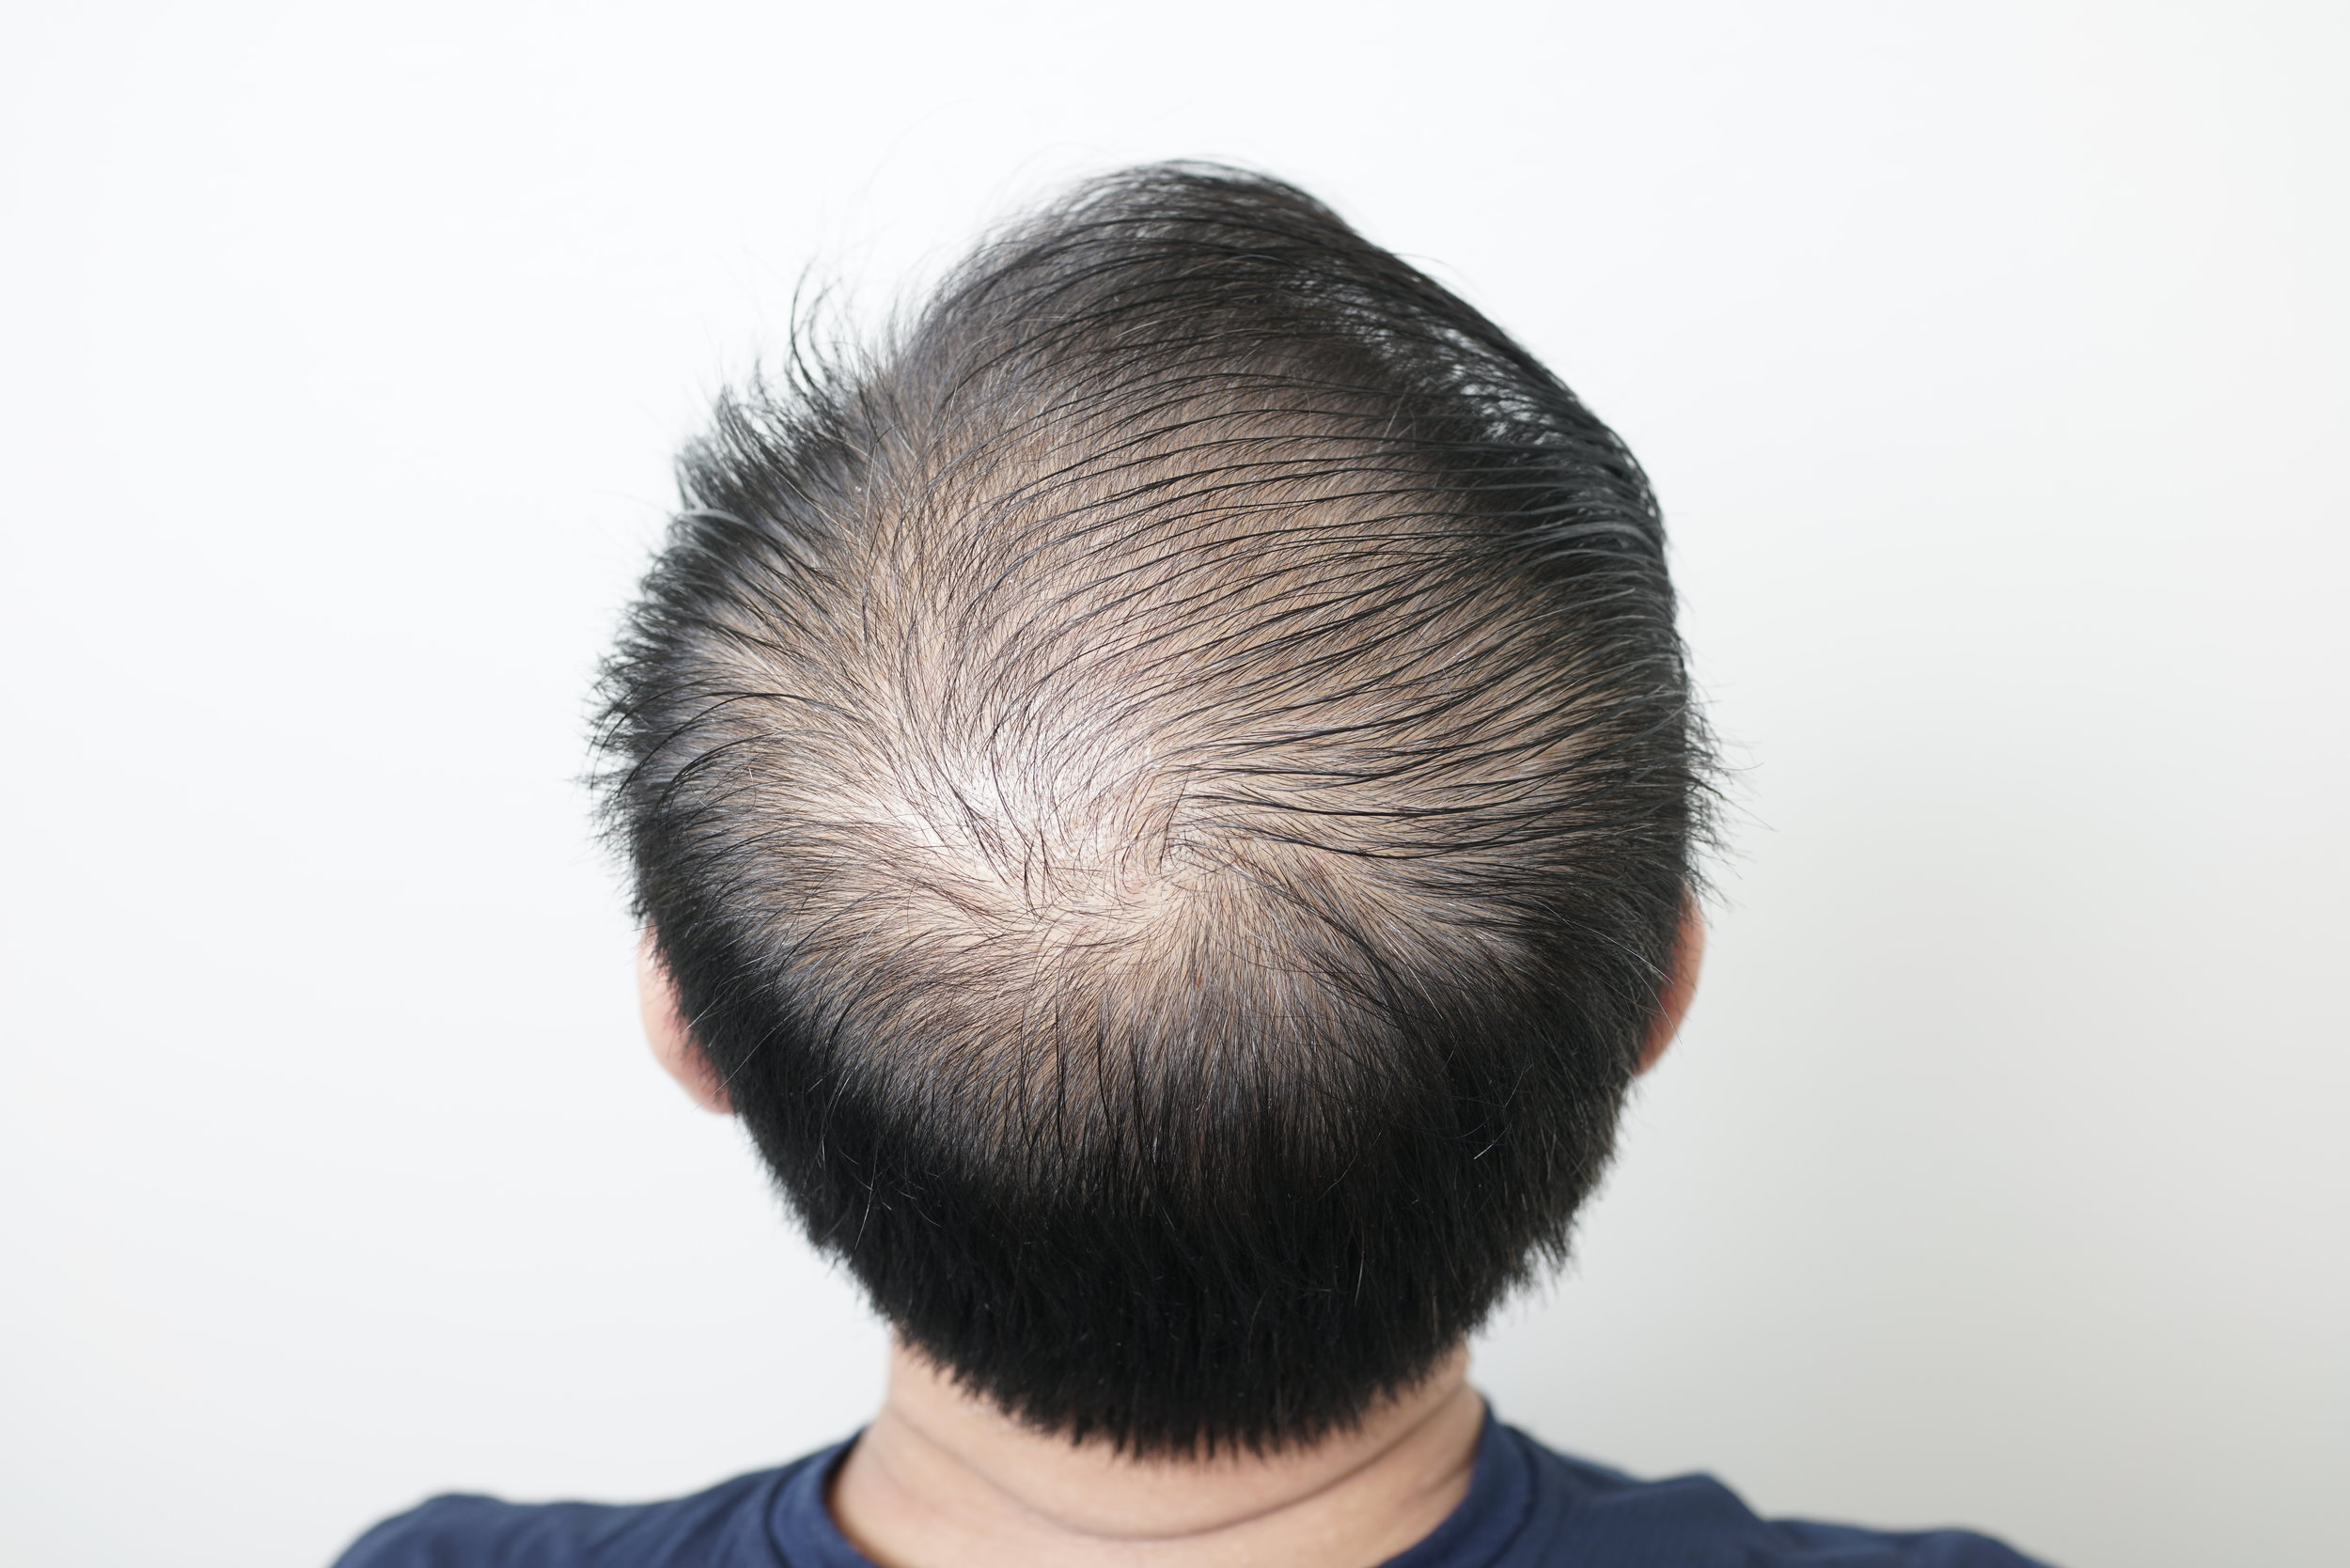 scalp-micropigmentation-hair-density2.JPG